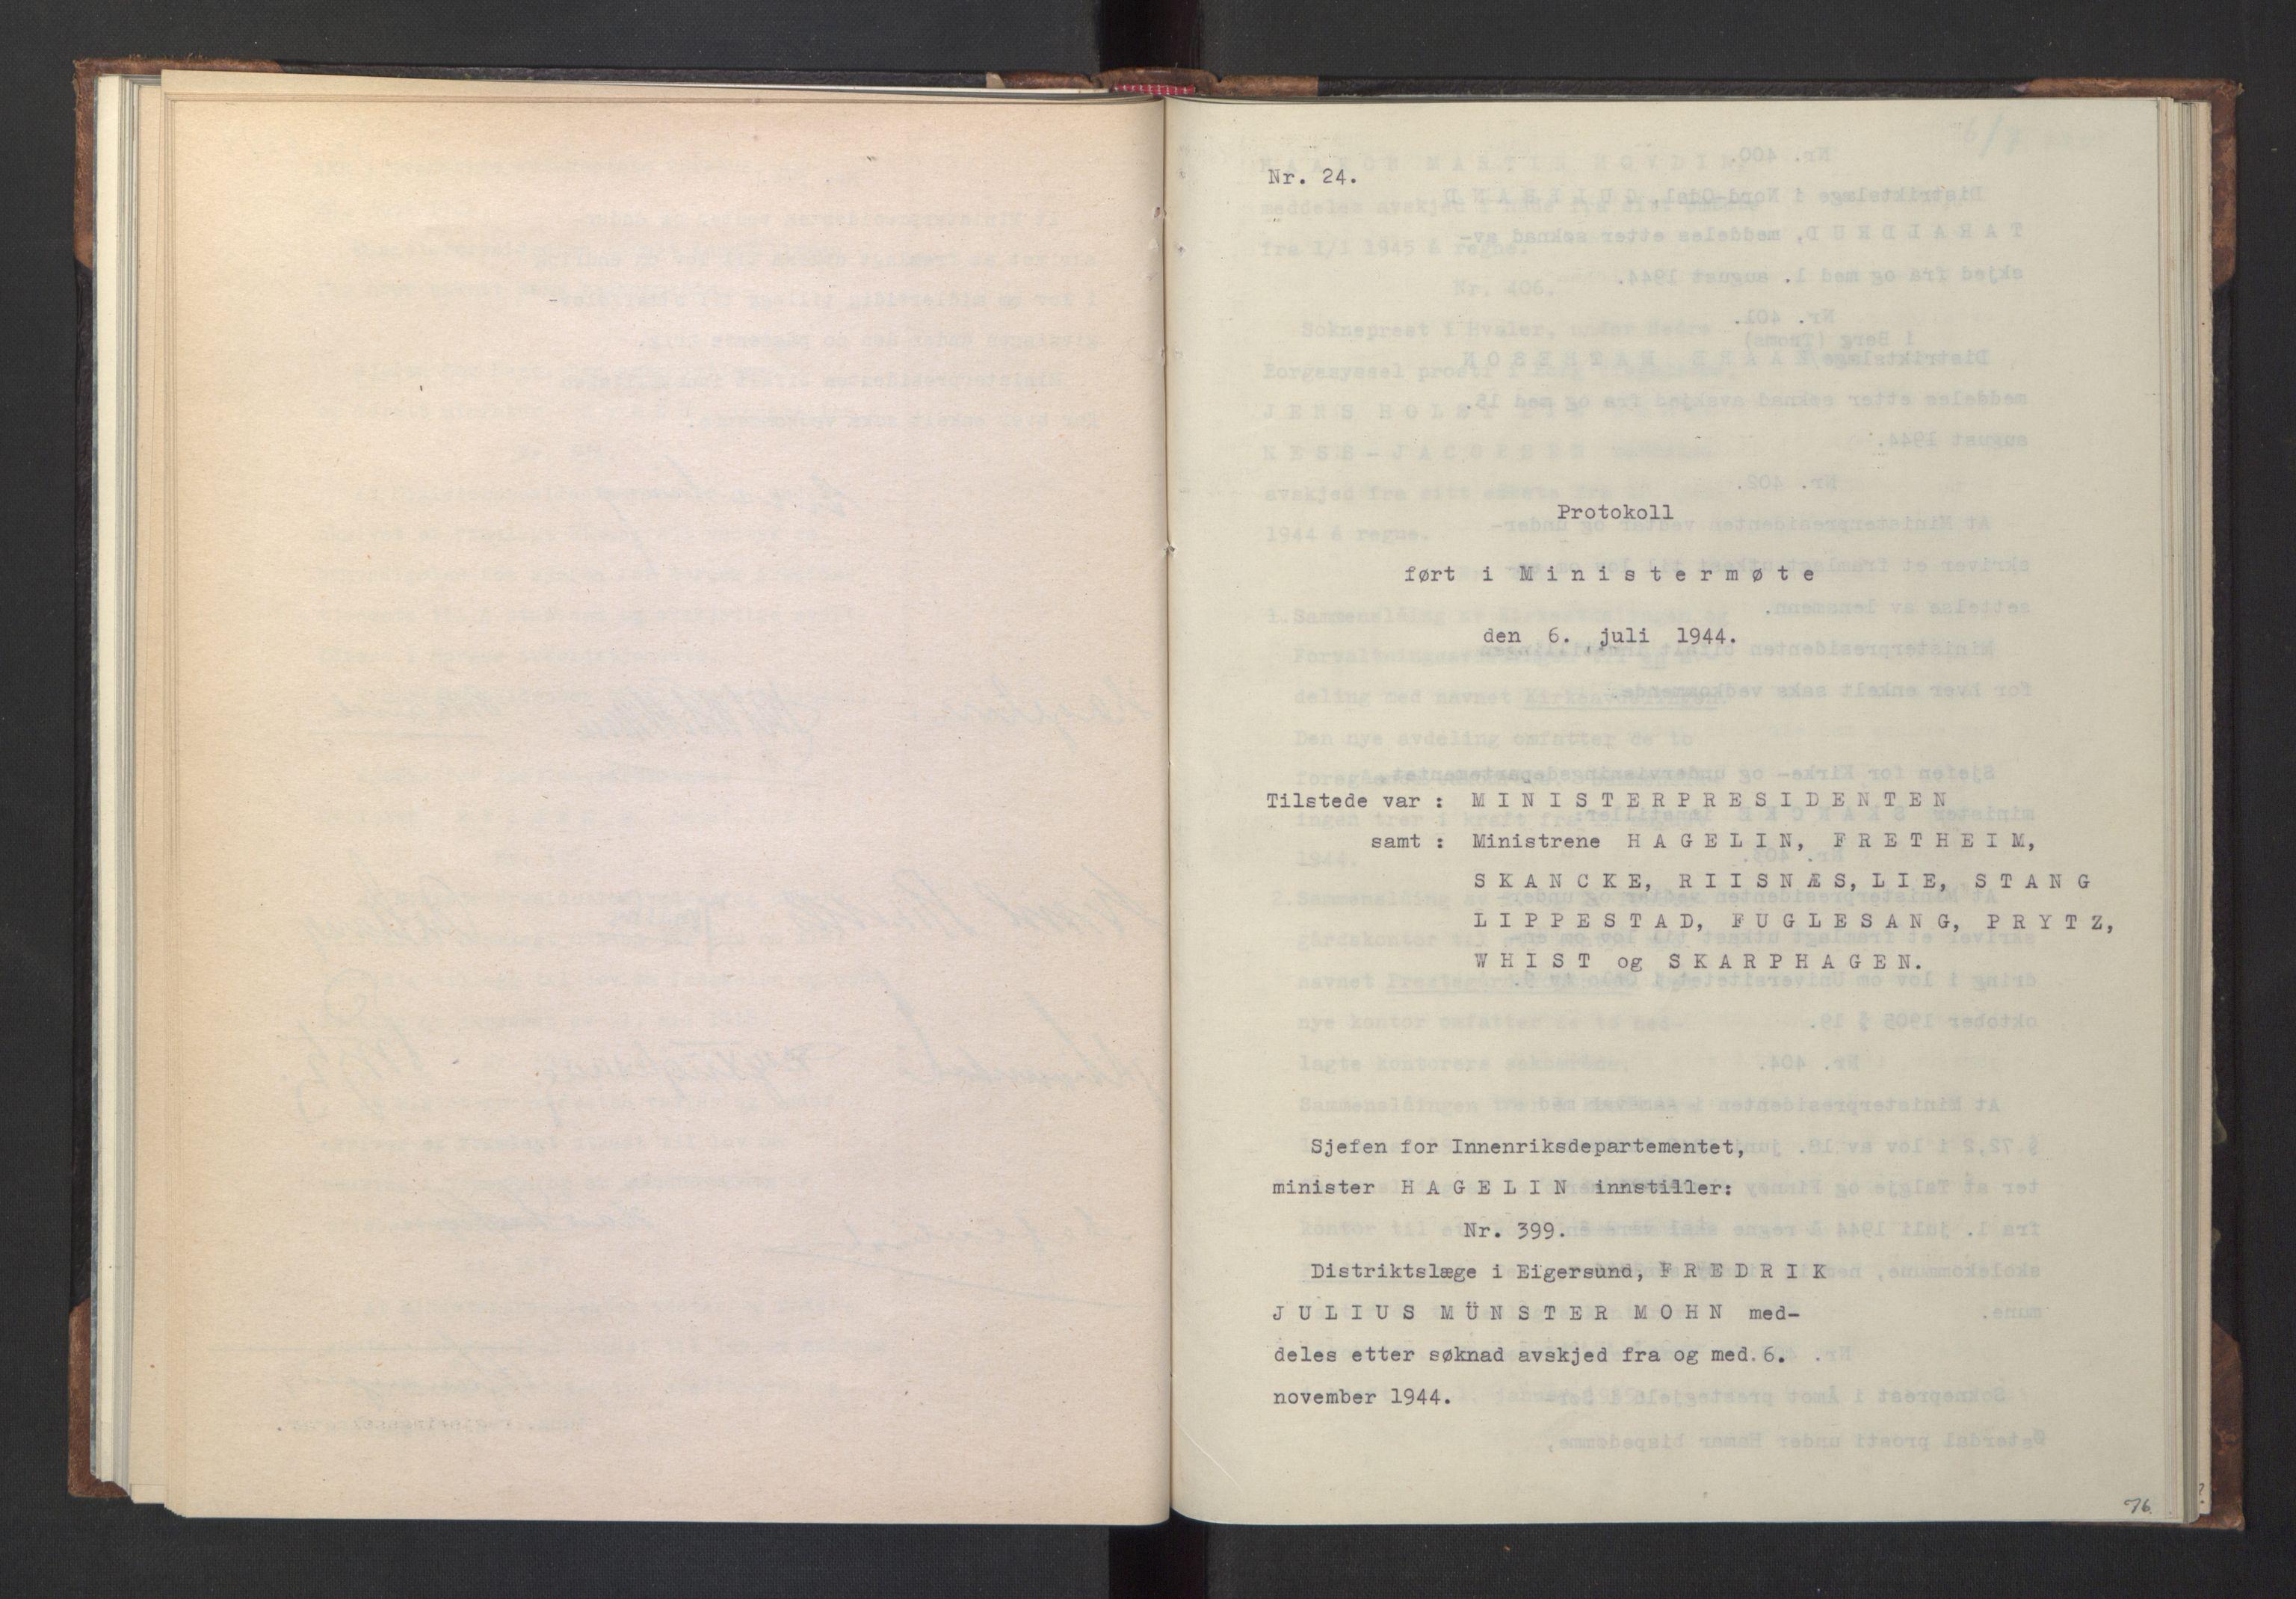 RA, NS-administrasjonen 1940-1945 (Statsrådsekretariatet, de kommisariske statsråder mm), D/Da/L0005: Protokoll fra ministermøter, 1944, s. 75b-76a